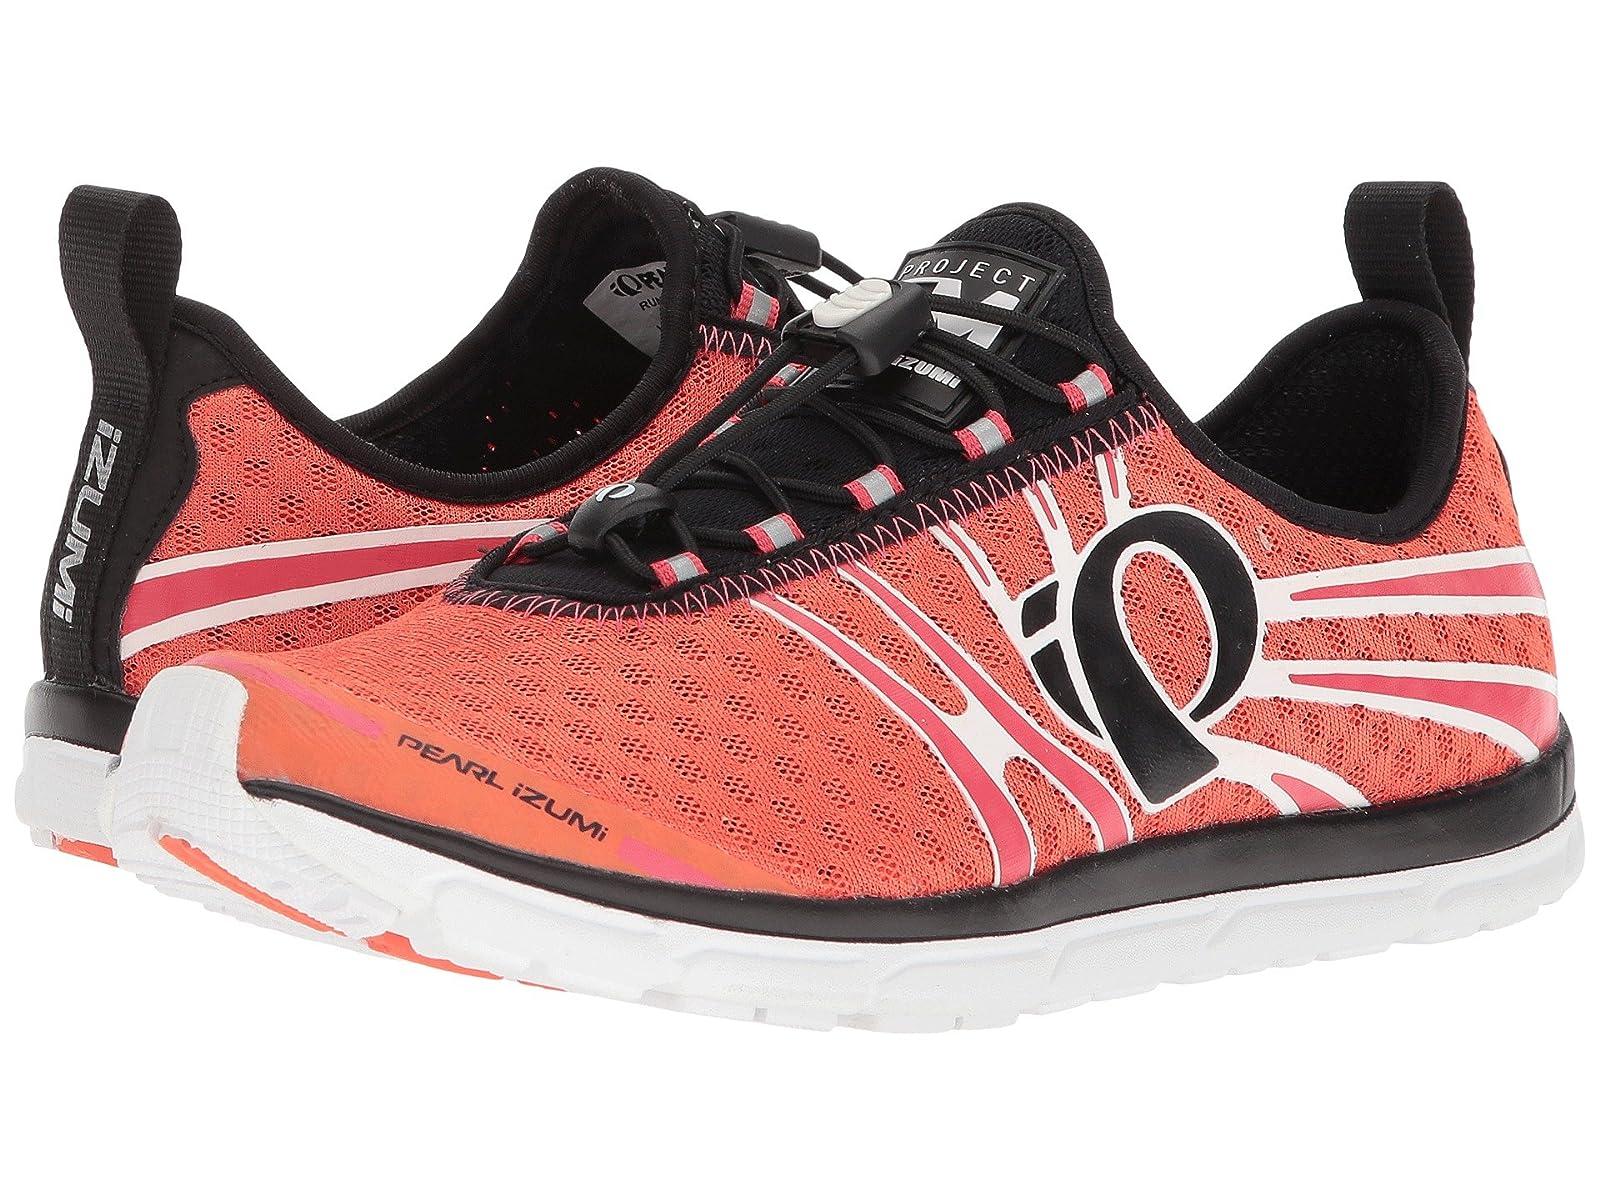 Pearl Izumi EM Tri N 1 v 2Cheap and distinctive eye-catching shoes